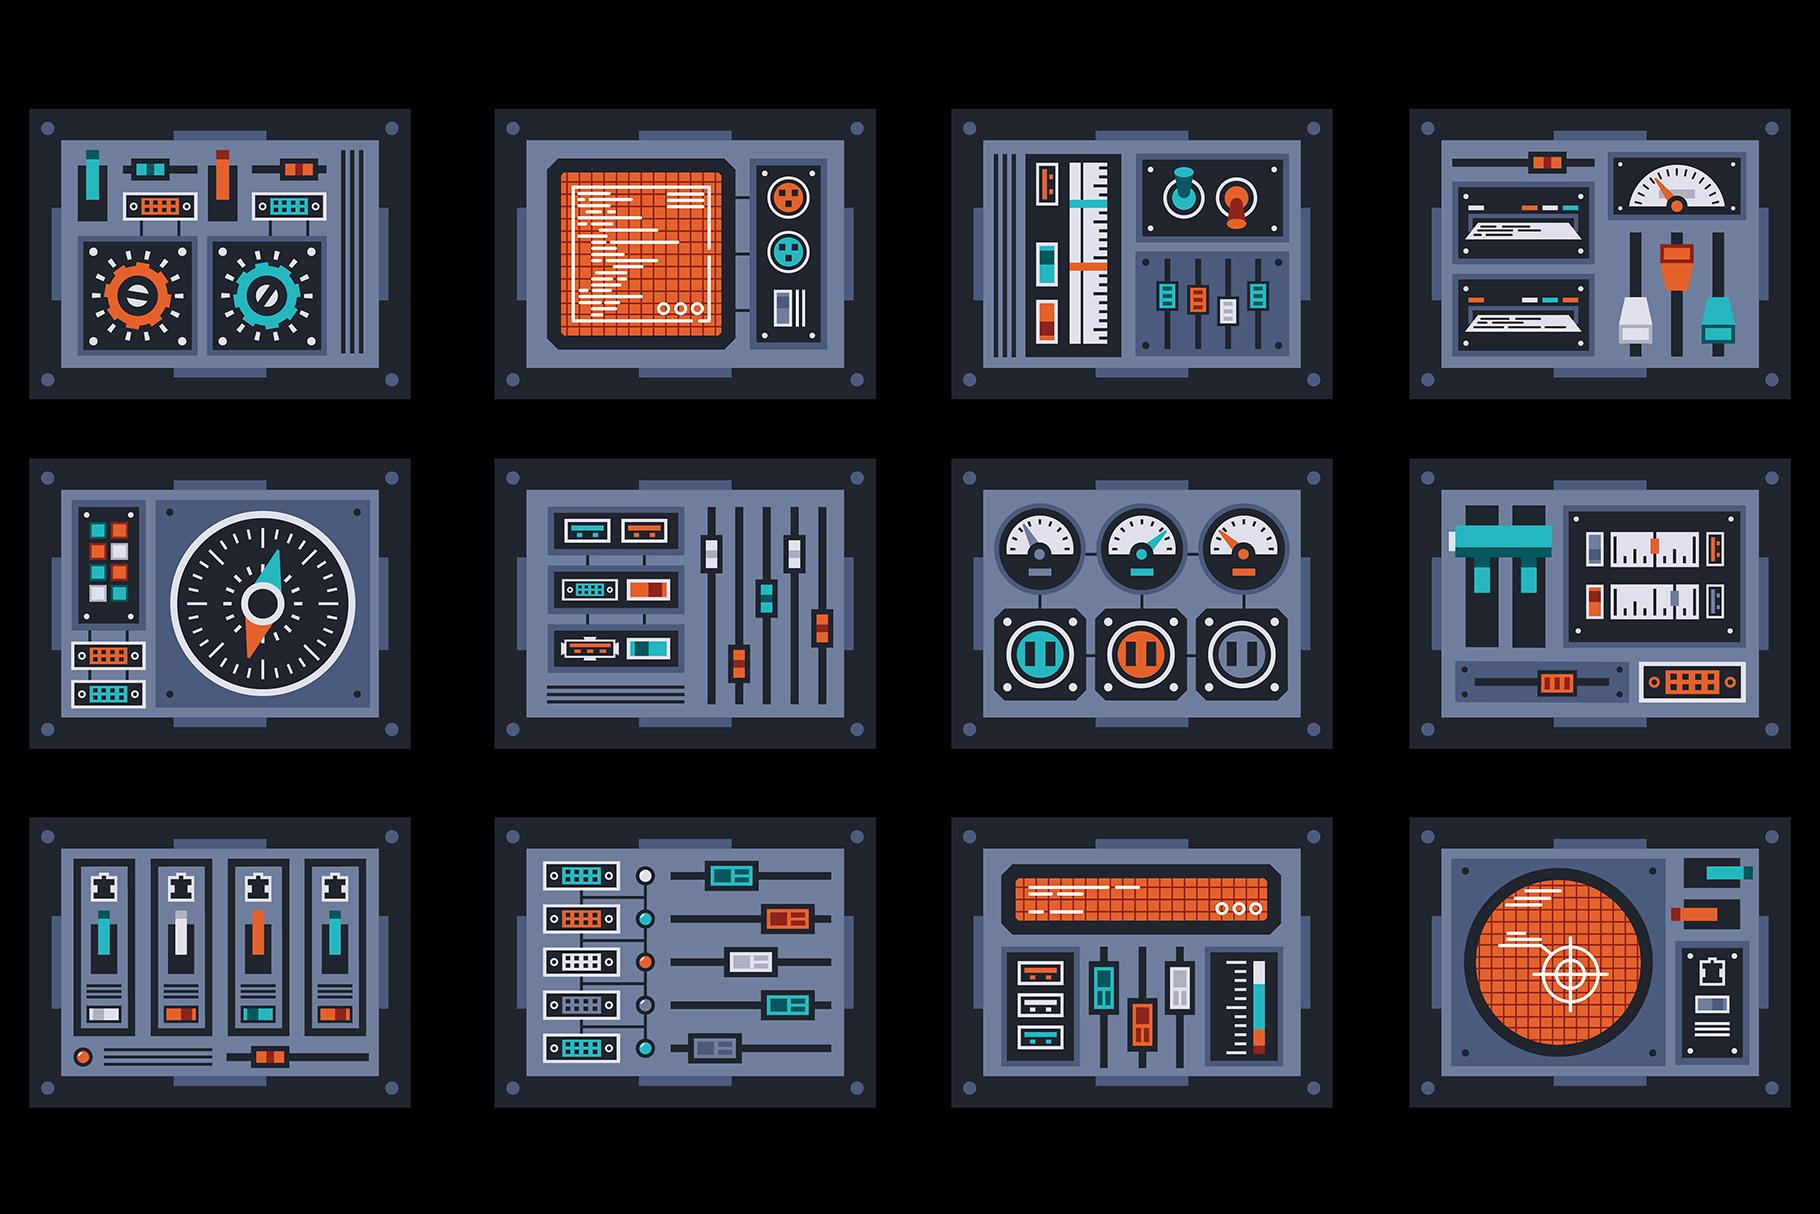 Control Panels Spaceship example image 3